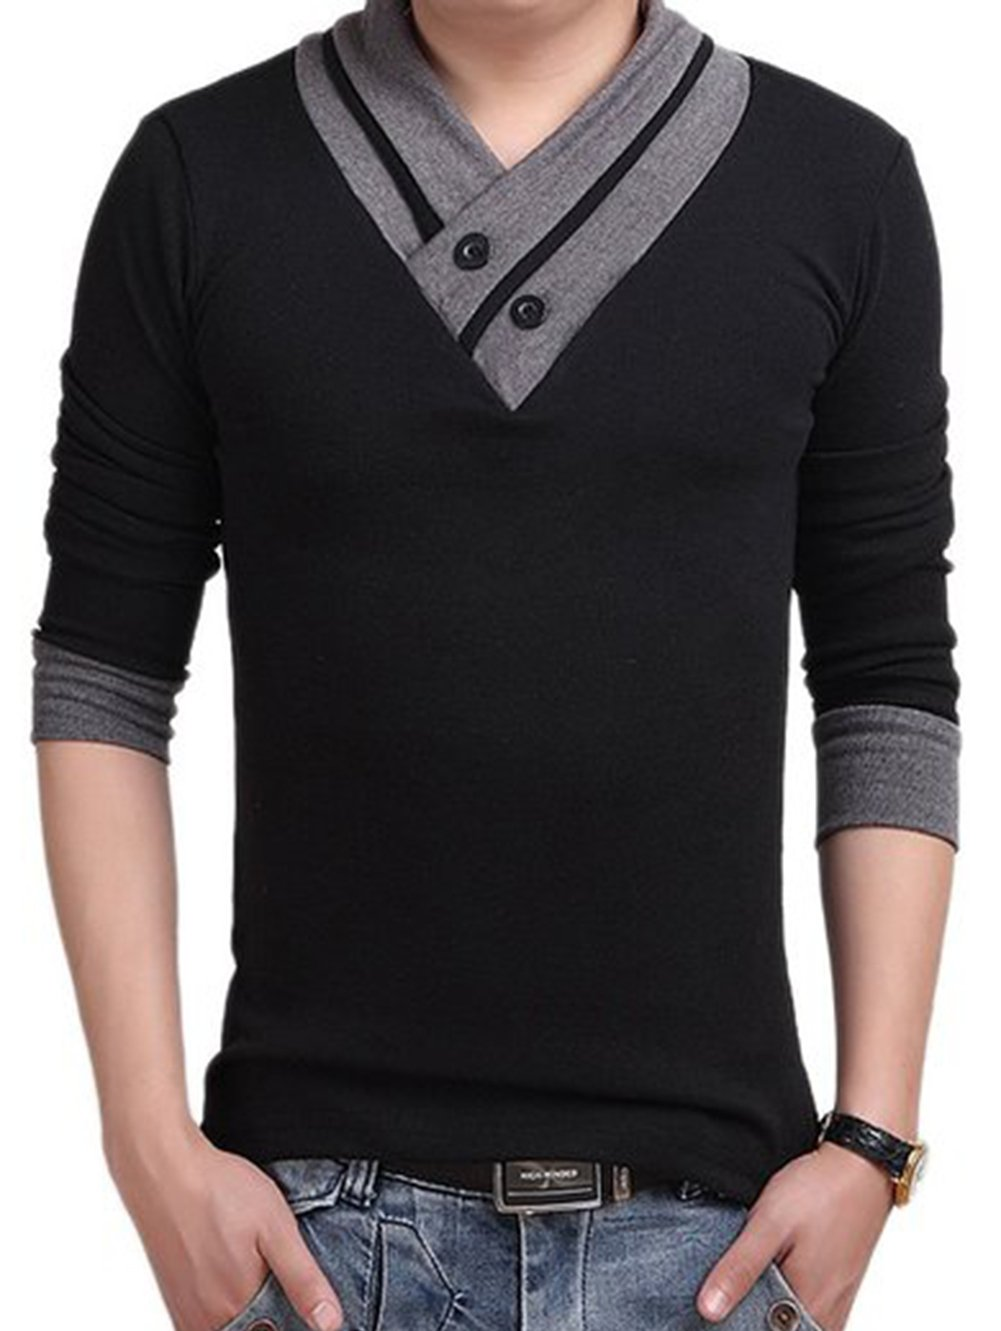 L'Asher Men Summer Fashion Button V Neck Slim Muscle Tops Tee T Shirt Tshirt (US M/Asia Tag XL, Black(Long Sleeve)) by L-Asher